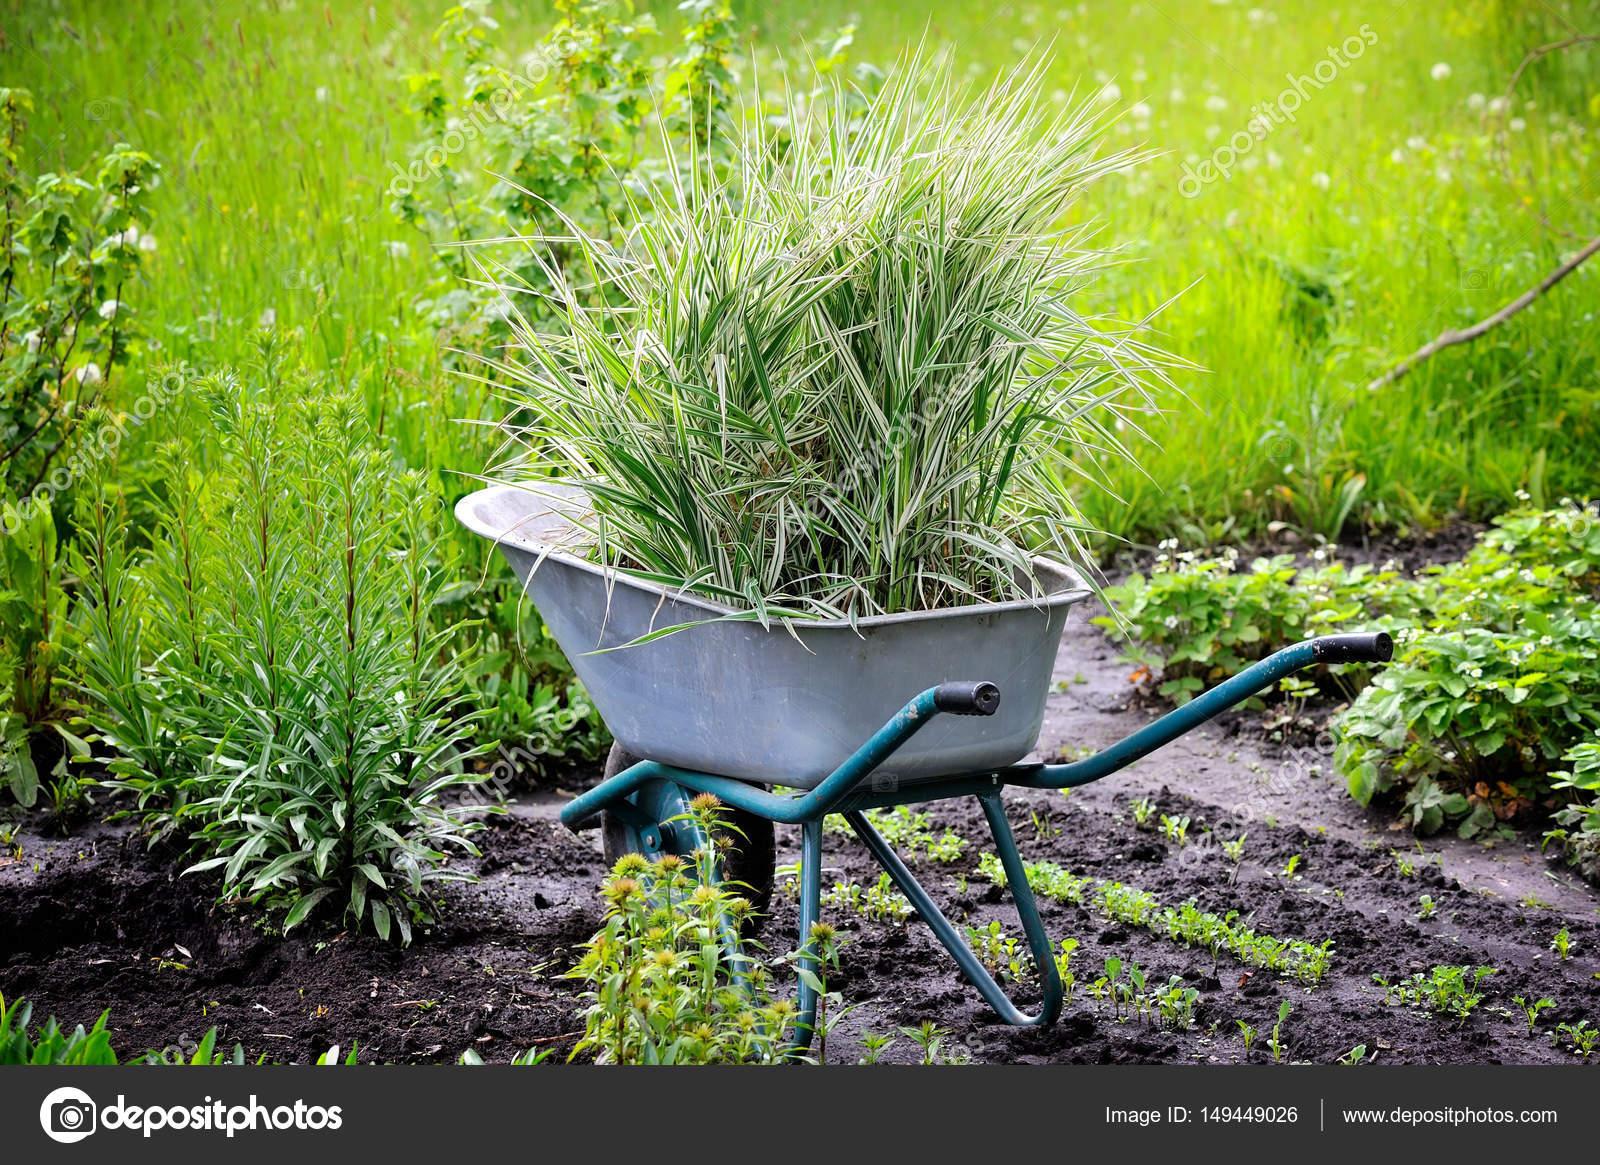 Wheelbarrow full with decorative sedges (Reed canary grass) for ...